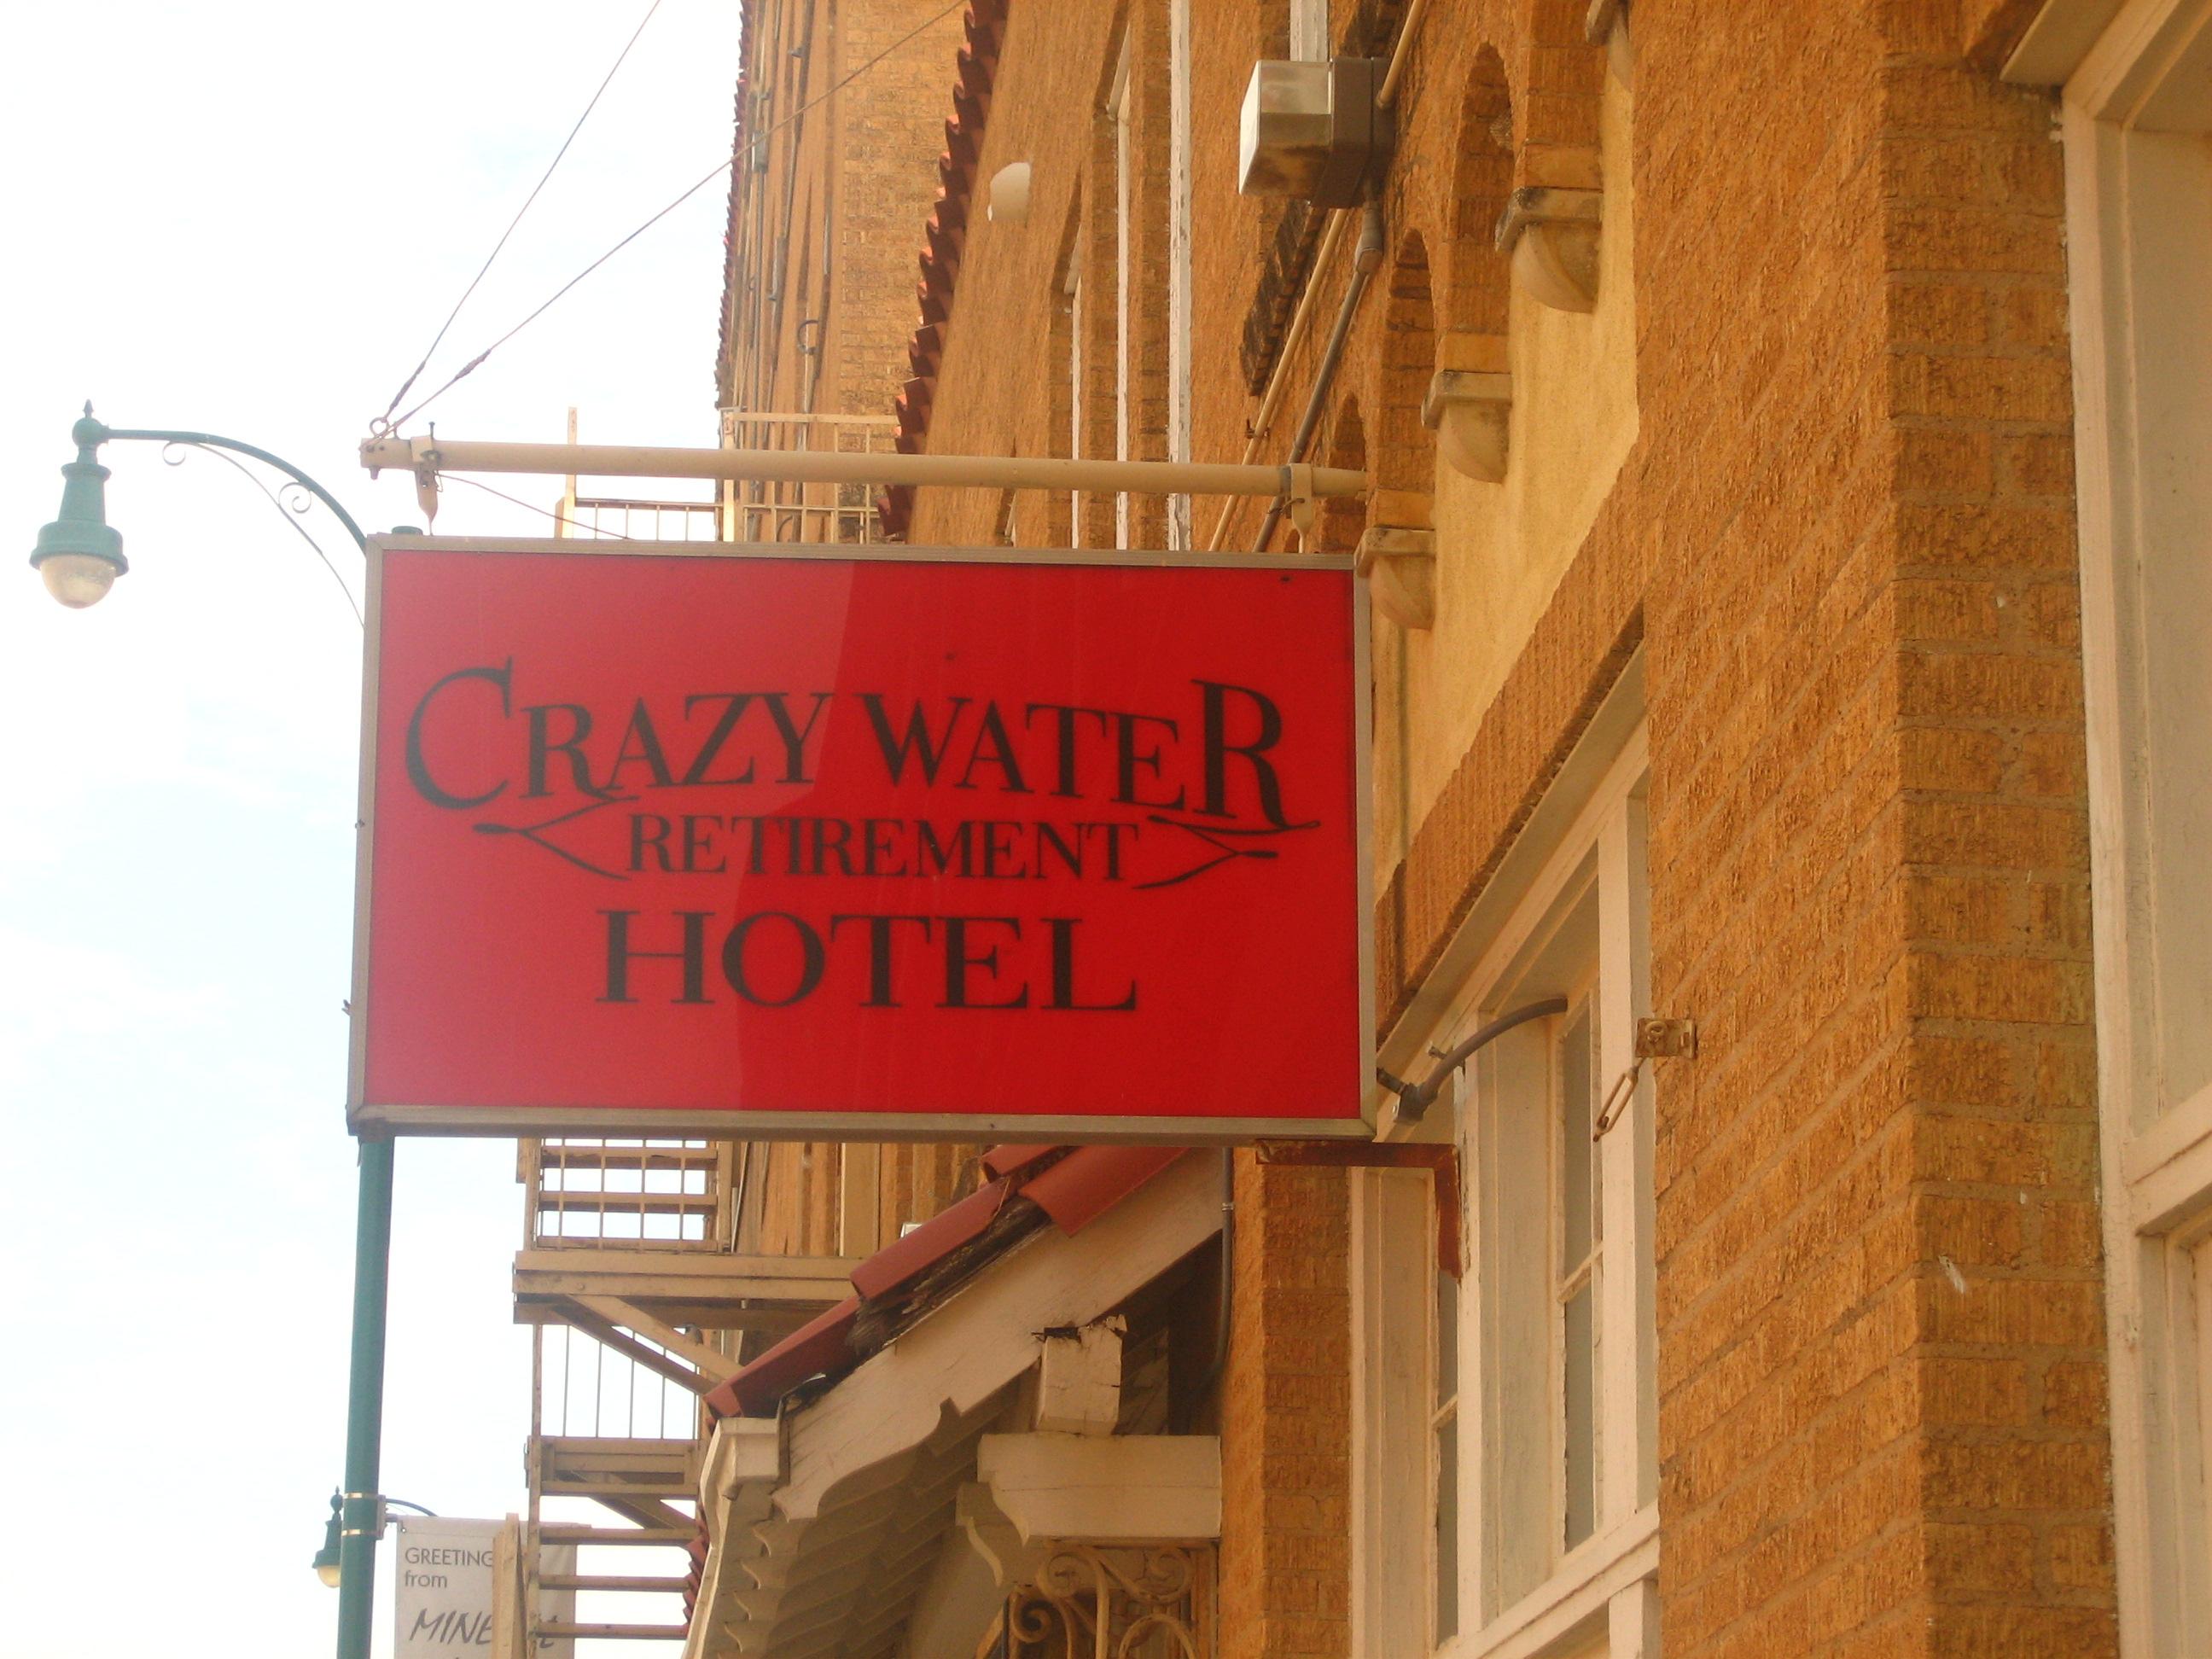 Filecrazy Water Retirement Hotel In Mineral Wells, Tx